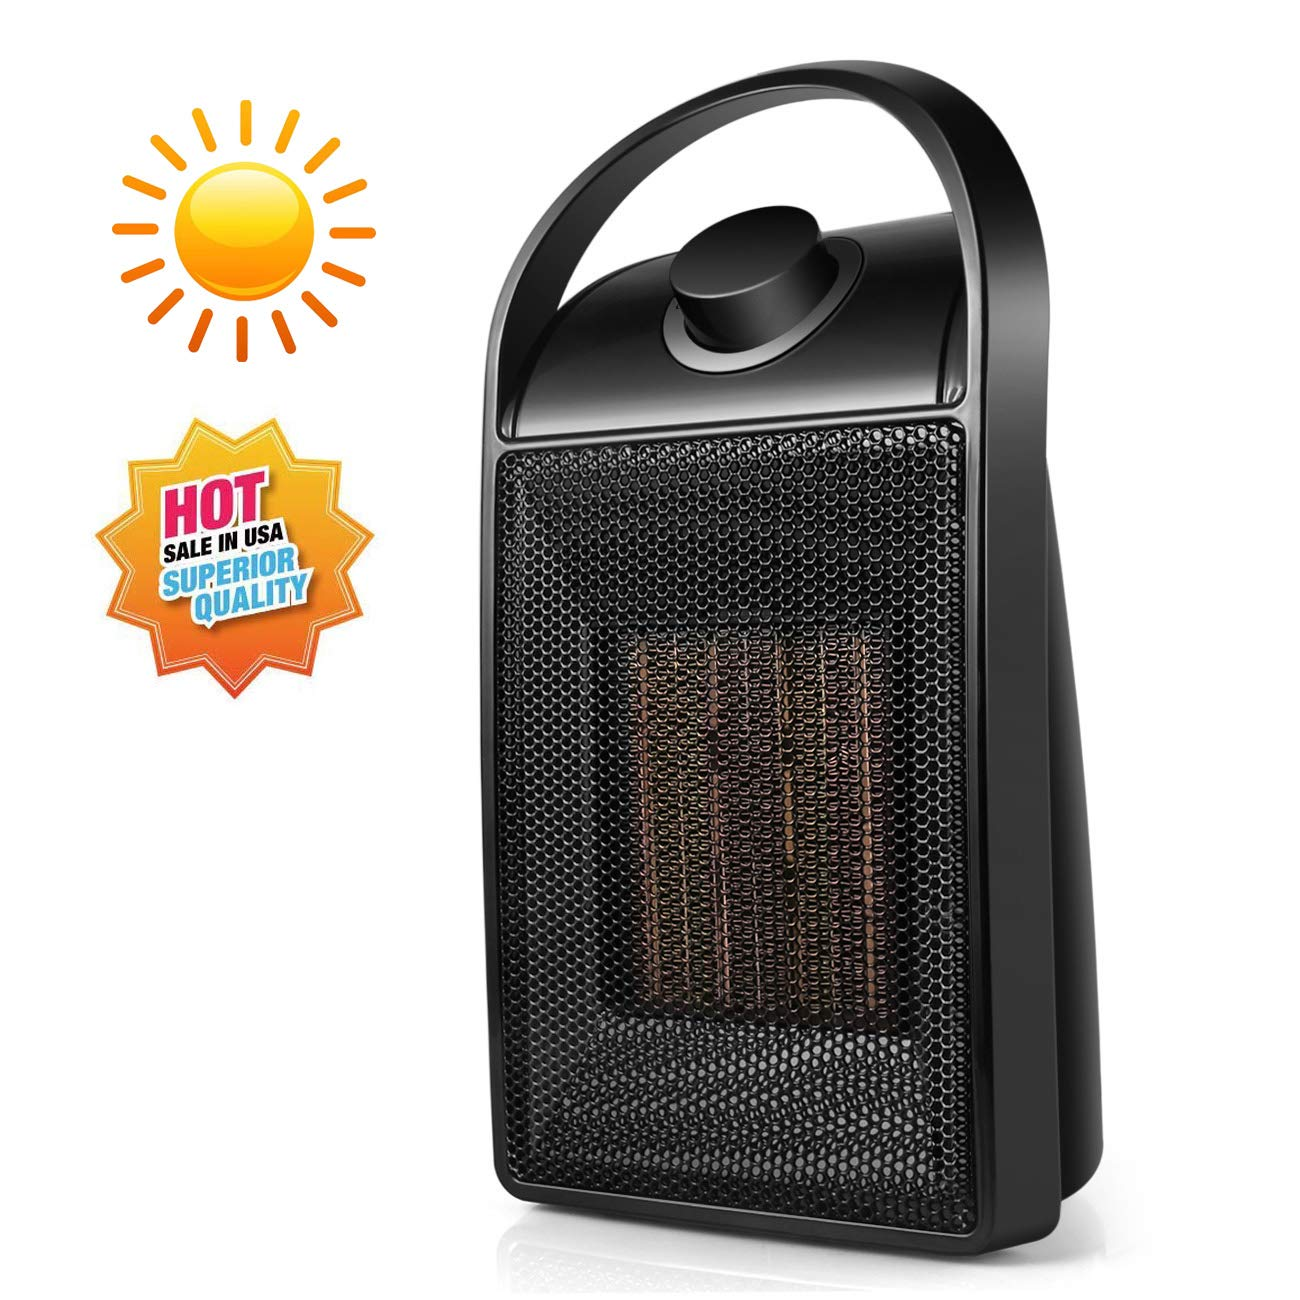 Space Heater, 1500 watt Personal ceramic portable mini heater desktop office home dorm, with adjustable thermostat- Black